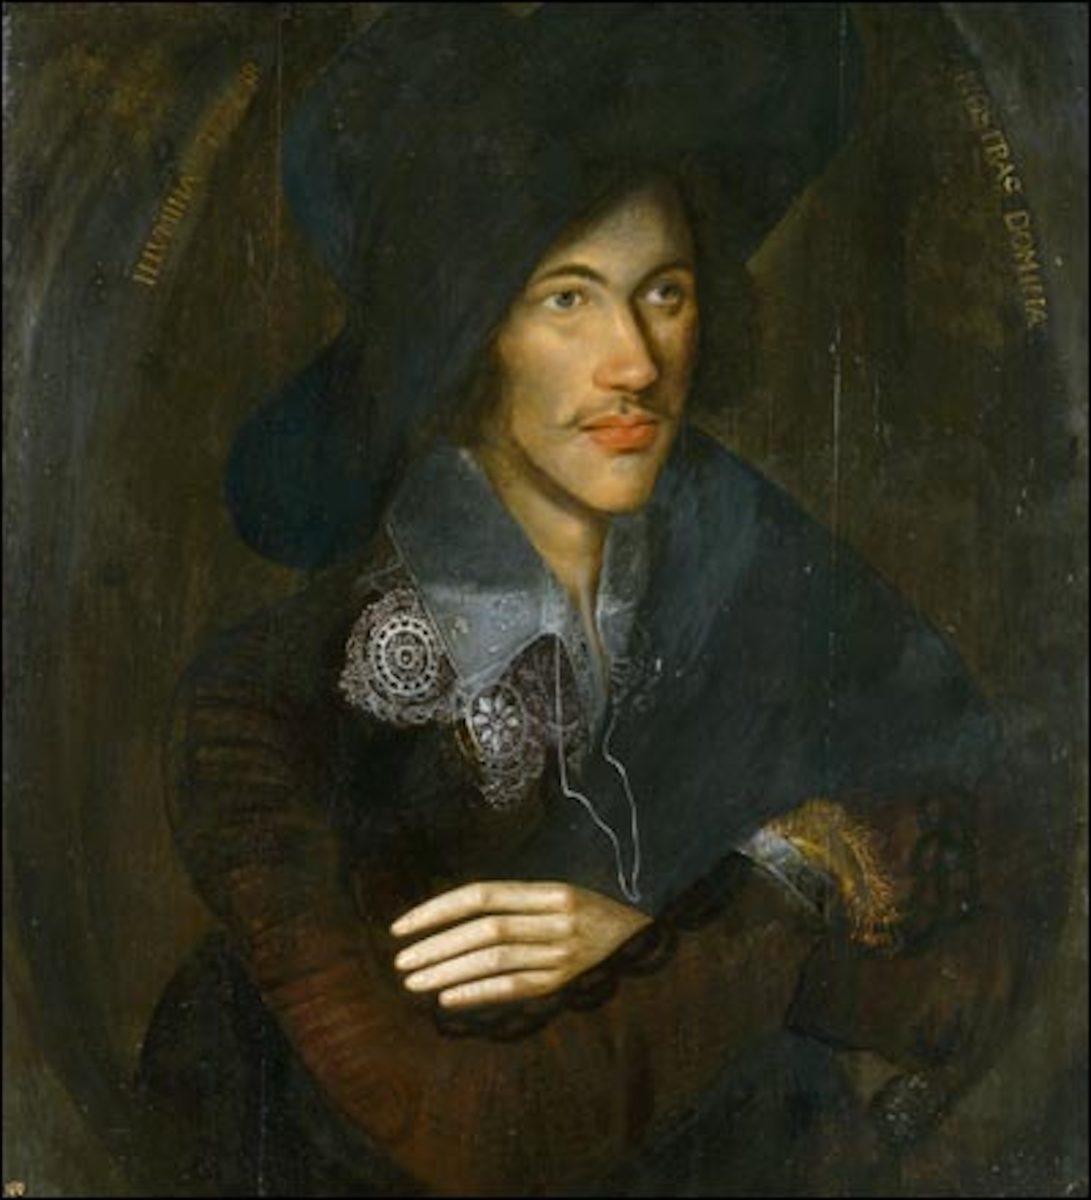 John Donne's Holy Sonnet XIX